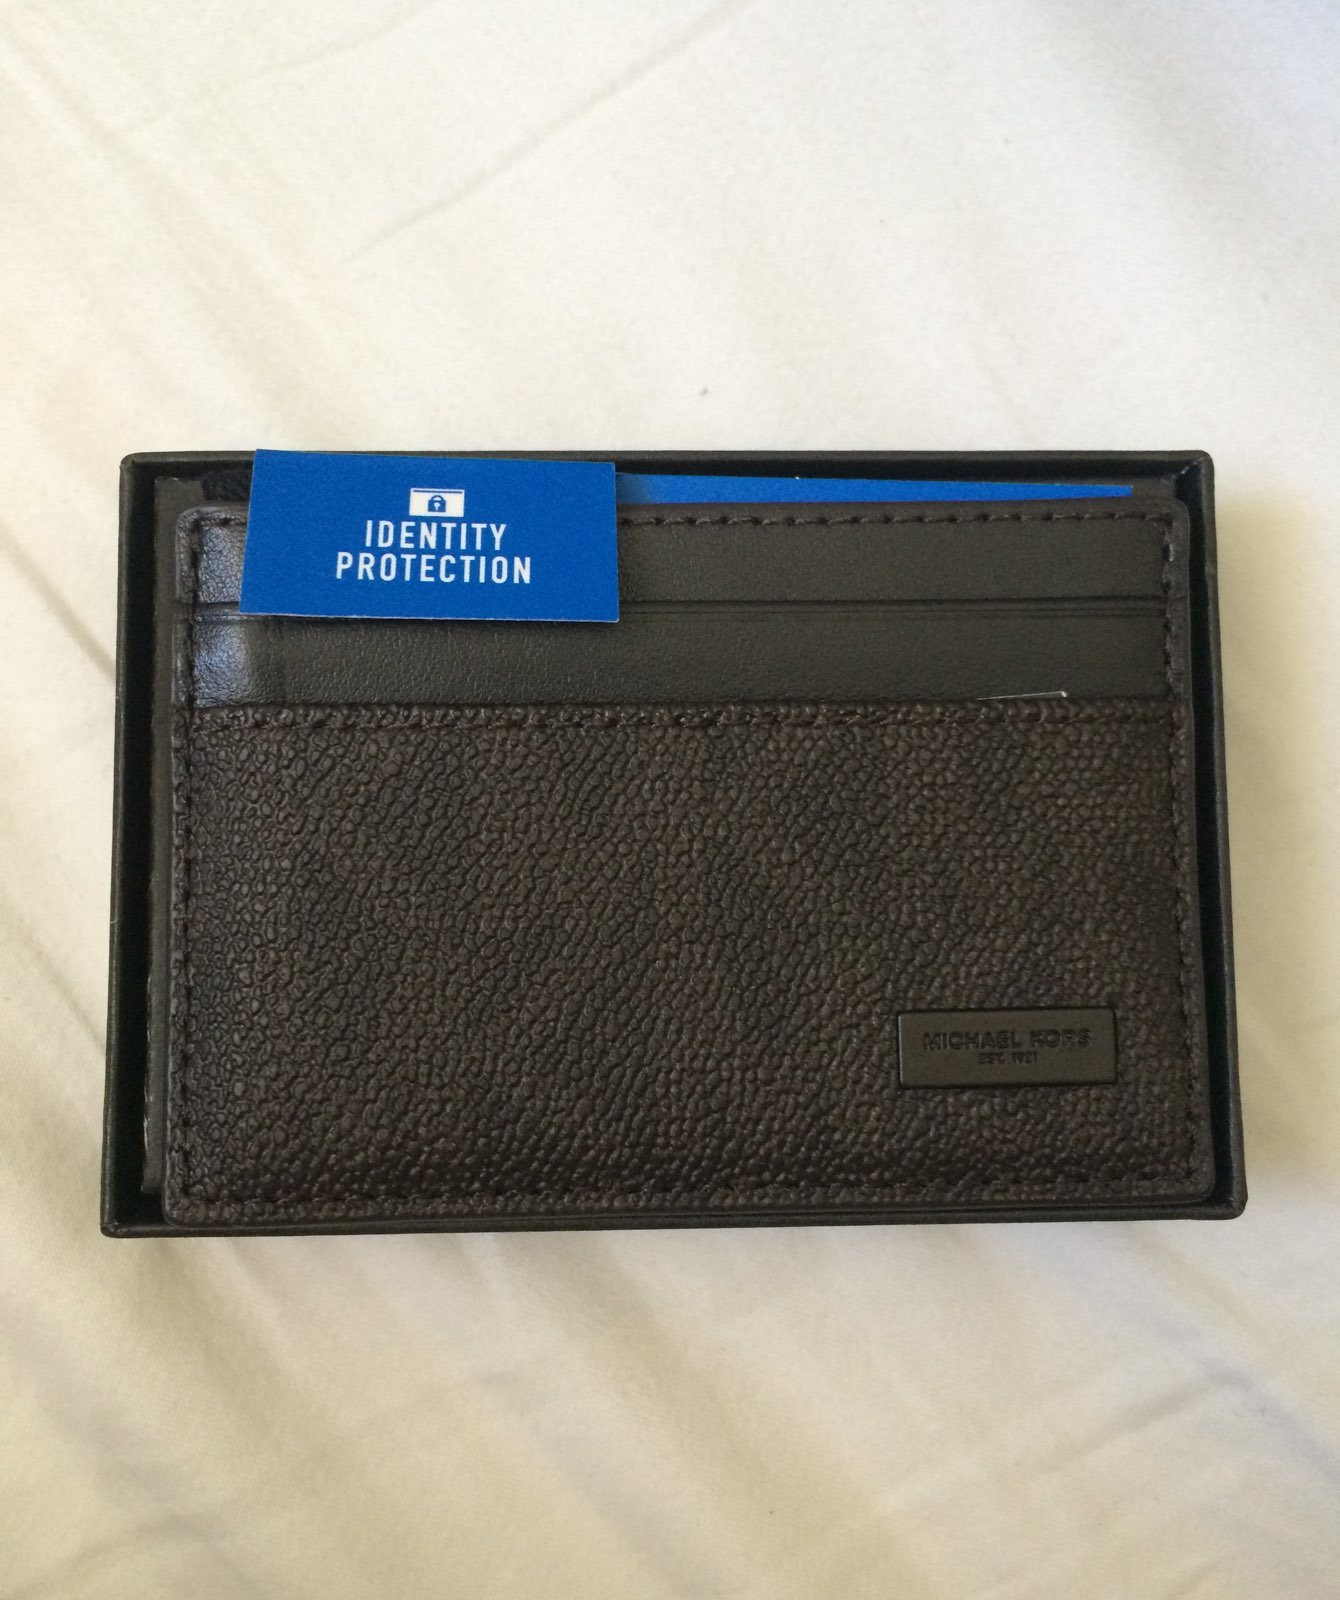 Michael Kors mens wallet/card holder